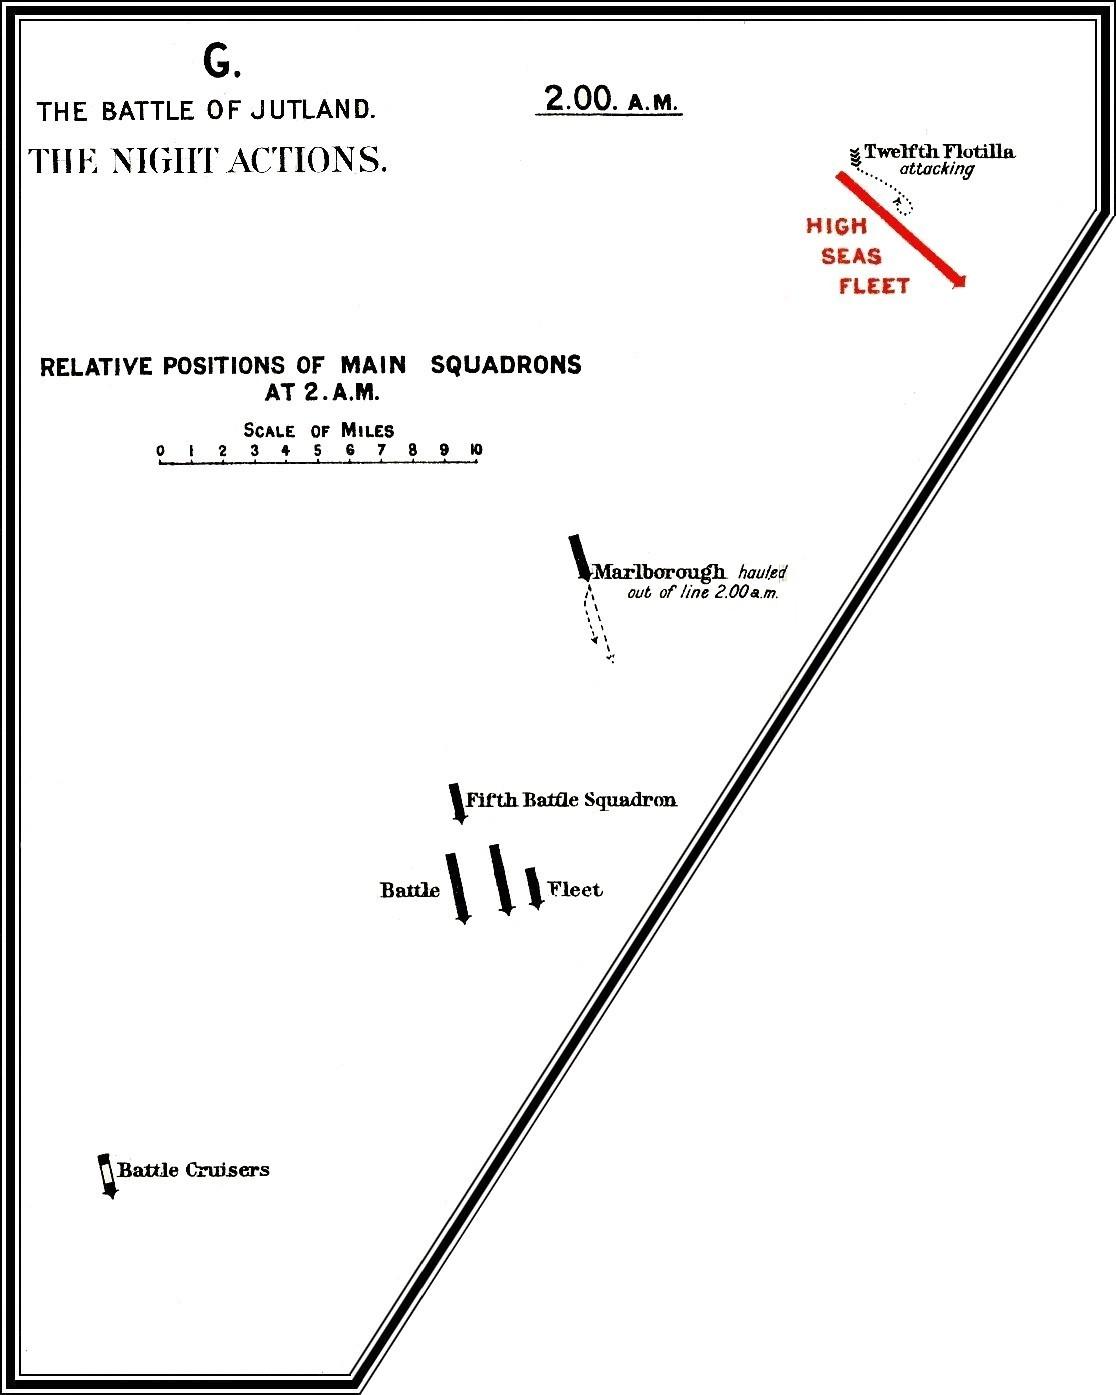 Royal navy naval operations volume 3 by sir julian corbett diagram 45 g 20 am nvjuhfo Choice Image